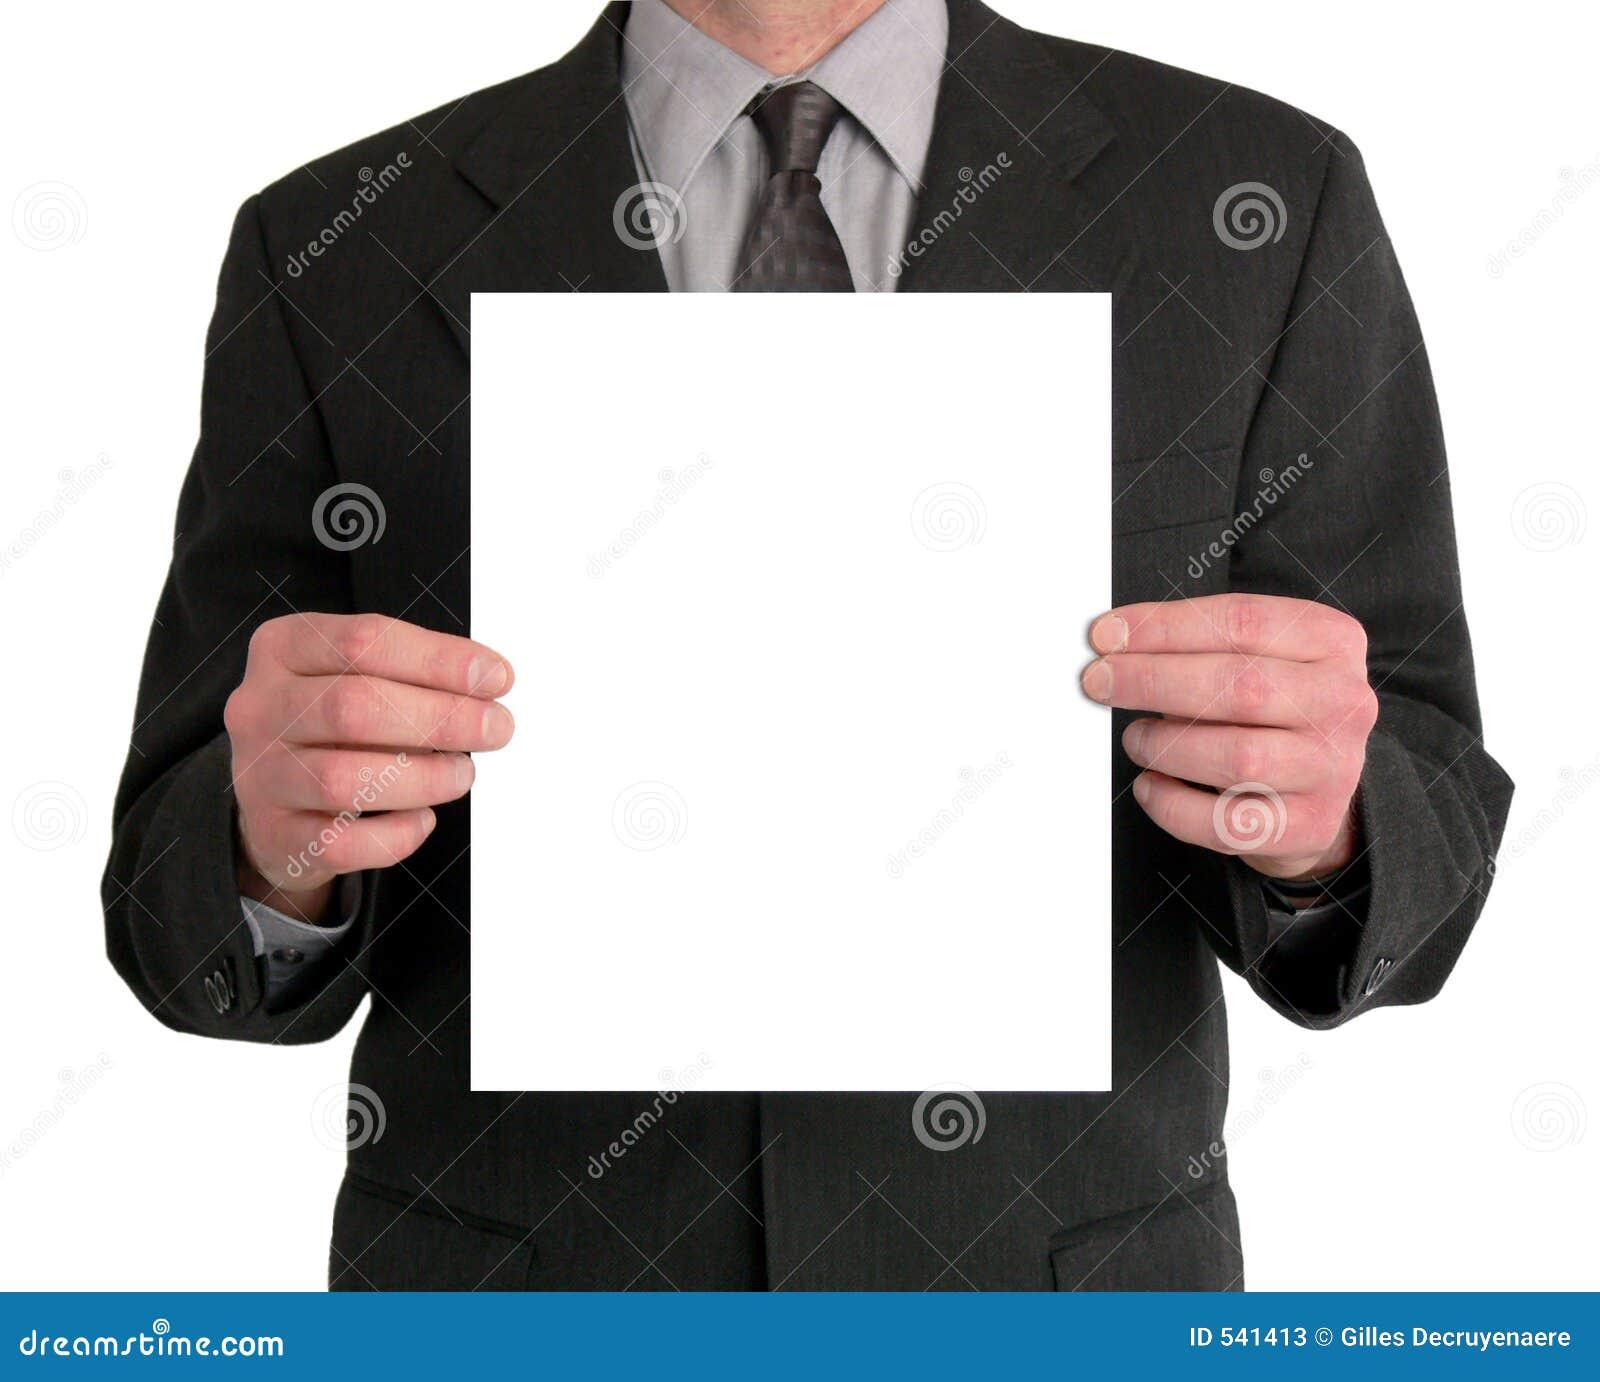 Download 空白生意人介绍 库存图片. 图片 包括有 人们, 领带, 显示, 存在, 赠送者, 商业, 人员, 现有量, 文件 - 541413